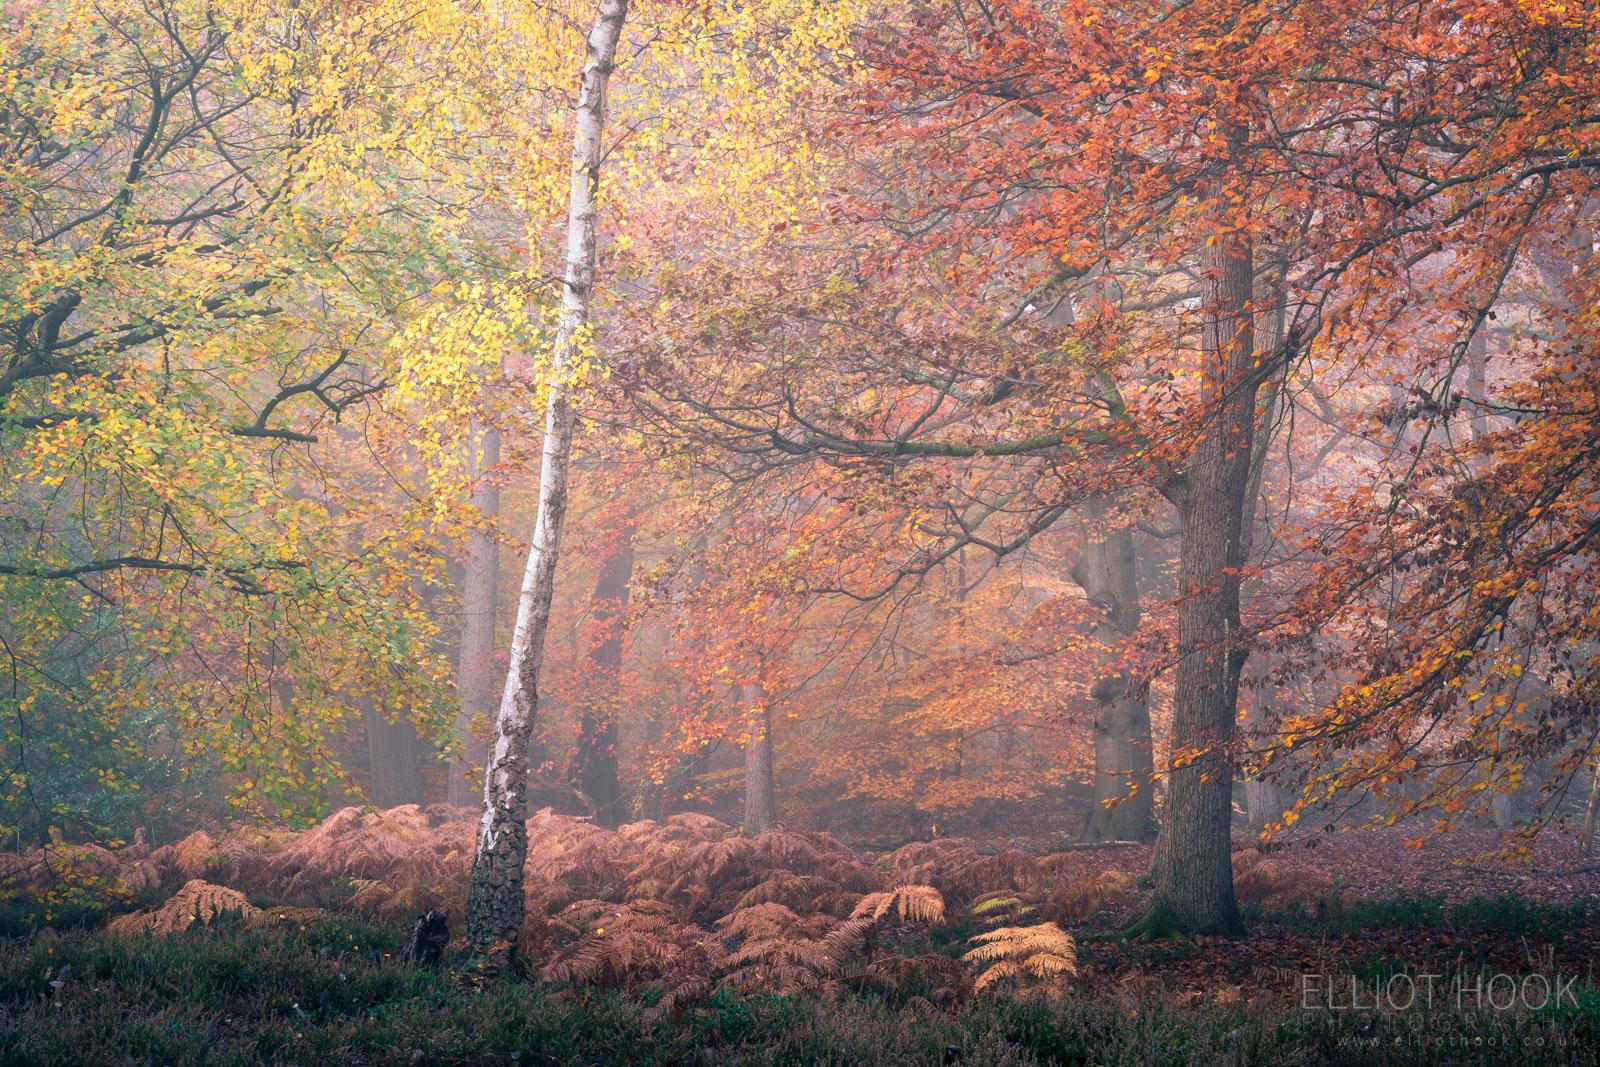 Colourful autumn woodland photograph